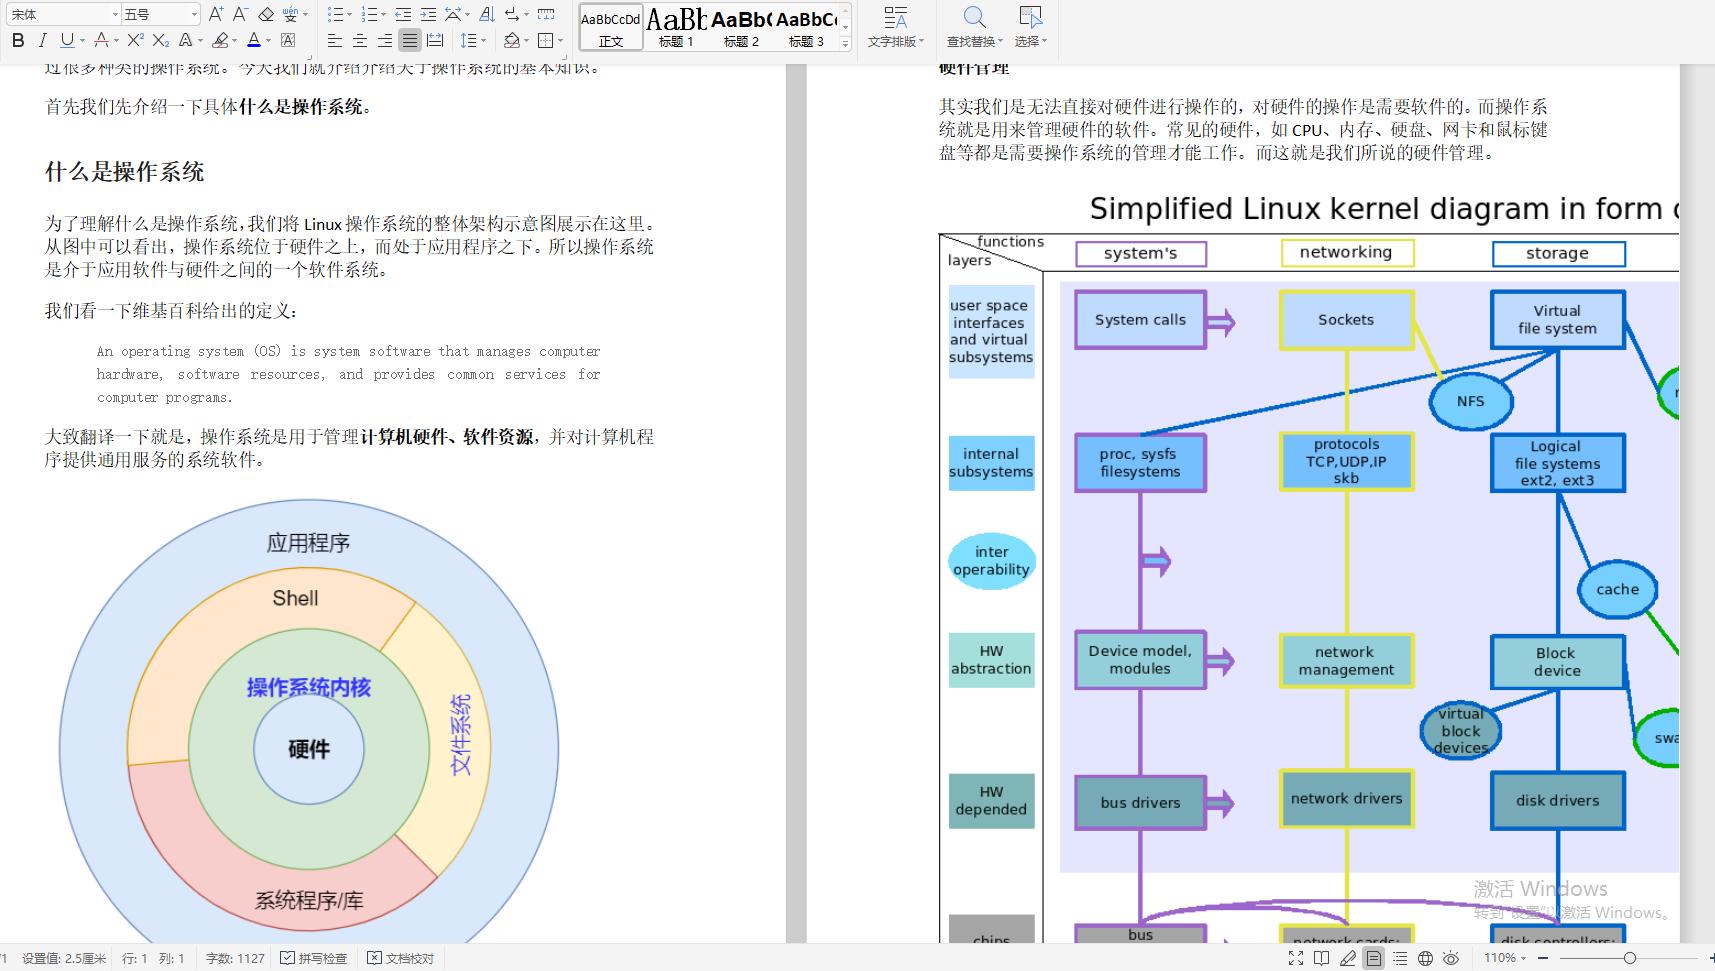 Java架构速成笔记:七大专题,1425页考点,挑战P8岗